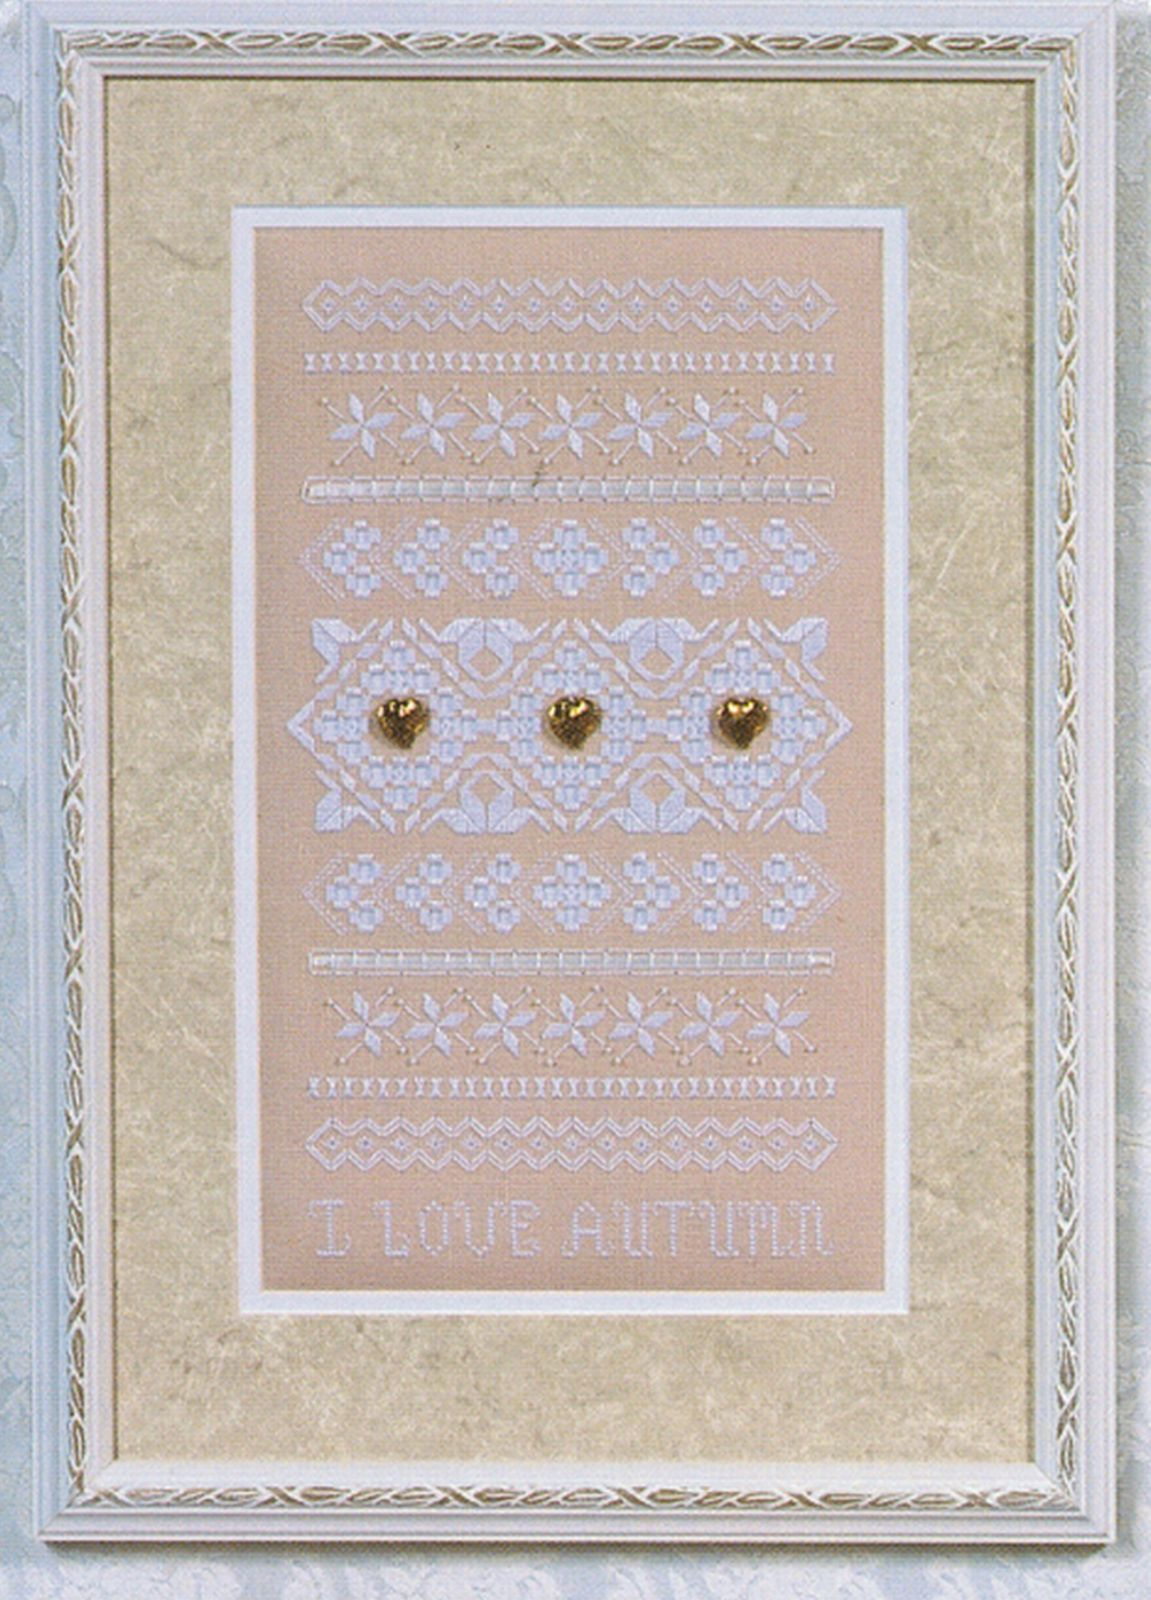 I Love Autumn Hardanger Embroidery Seasonal Sampler Rosalyn Watnemo Book image 4